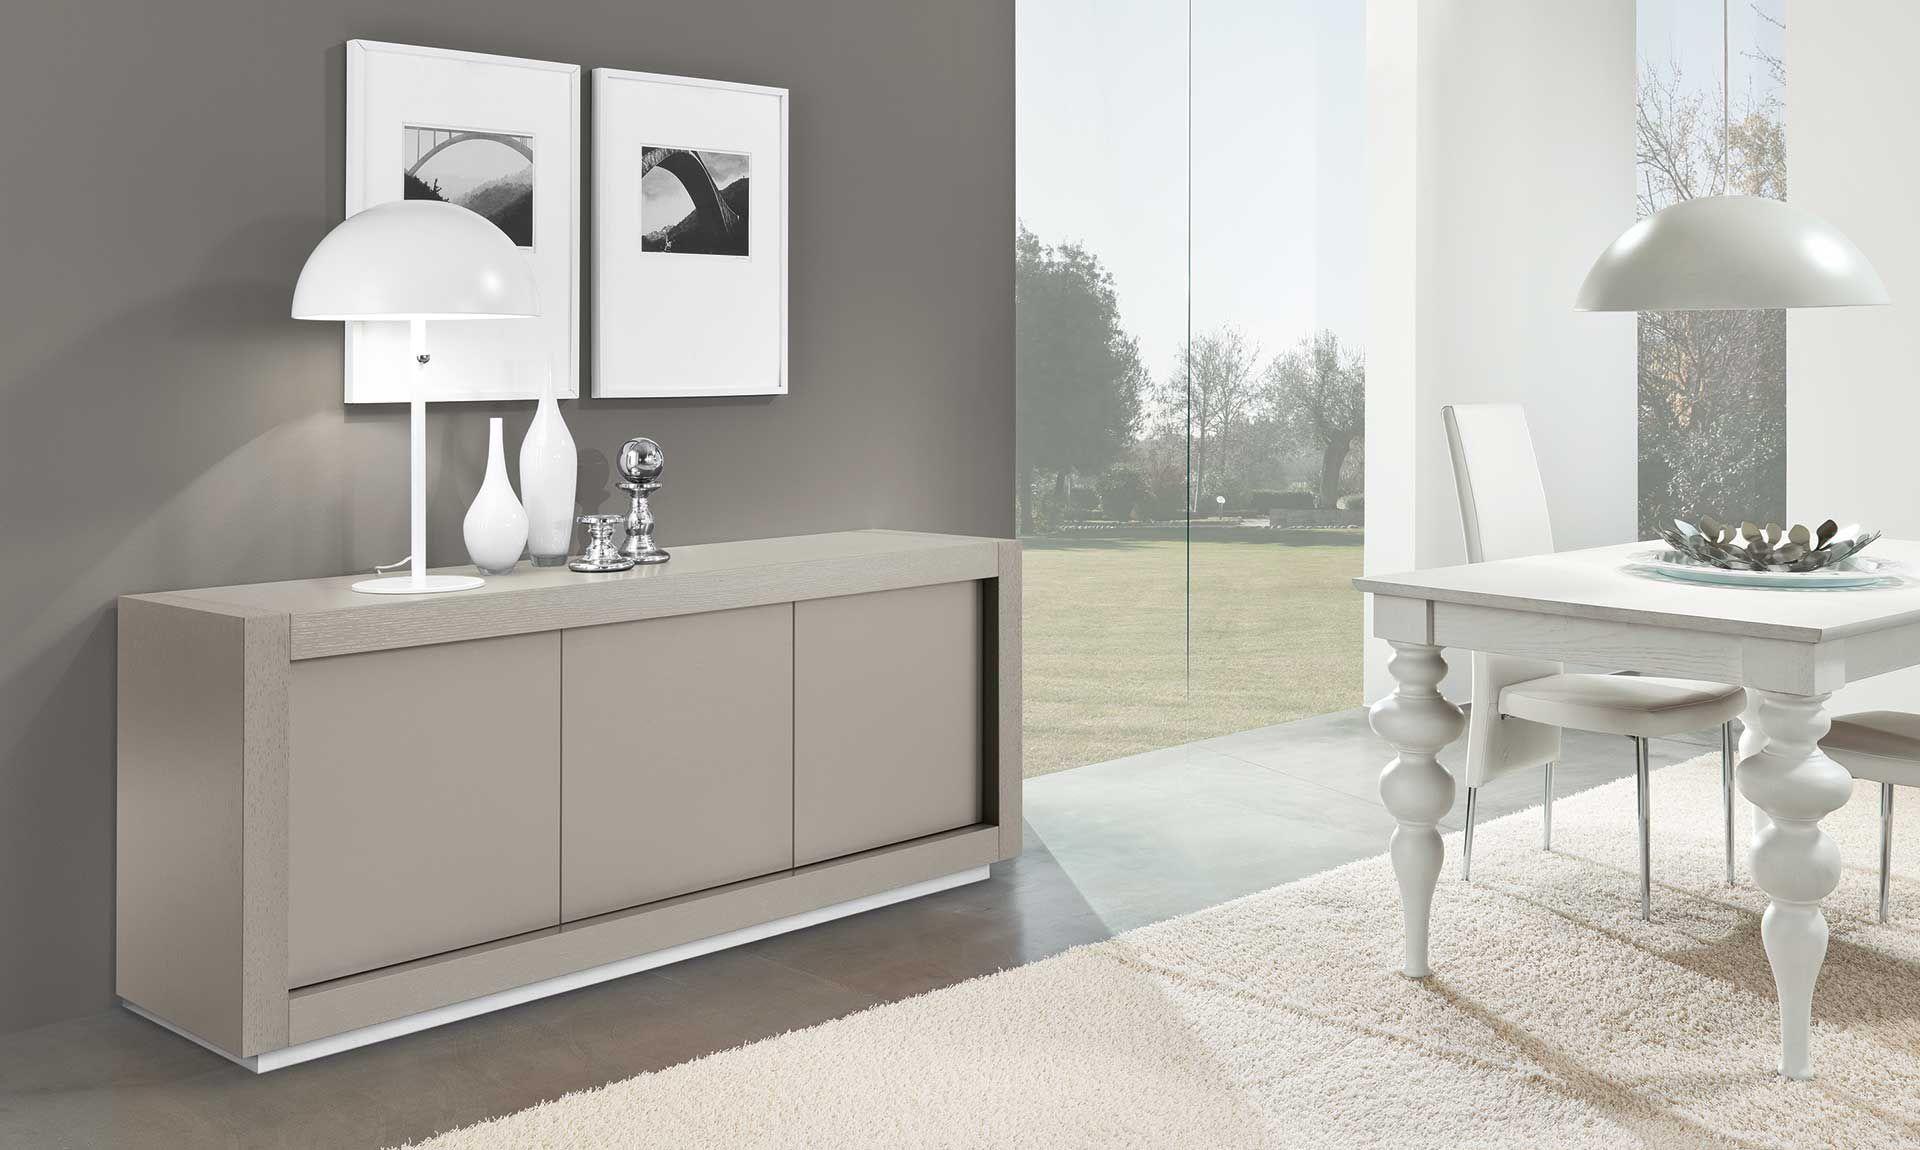 Credenza Moderna Tre Ante : Credenza sospesa moderna design salve nero bianco larghezza